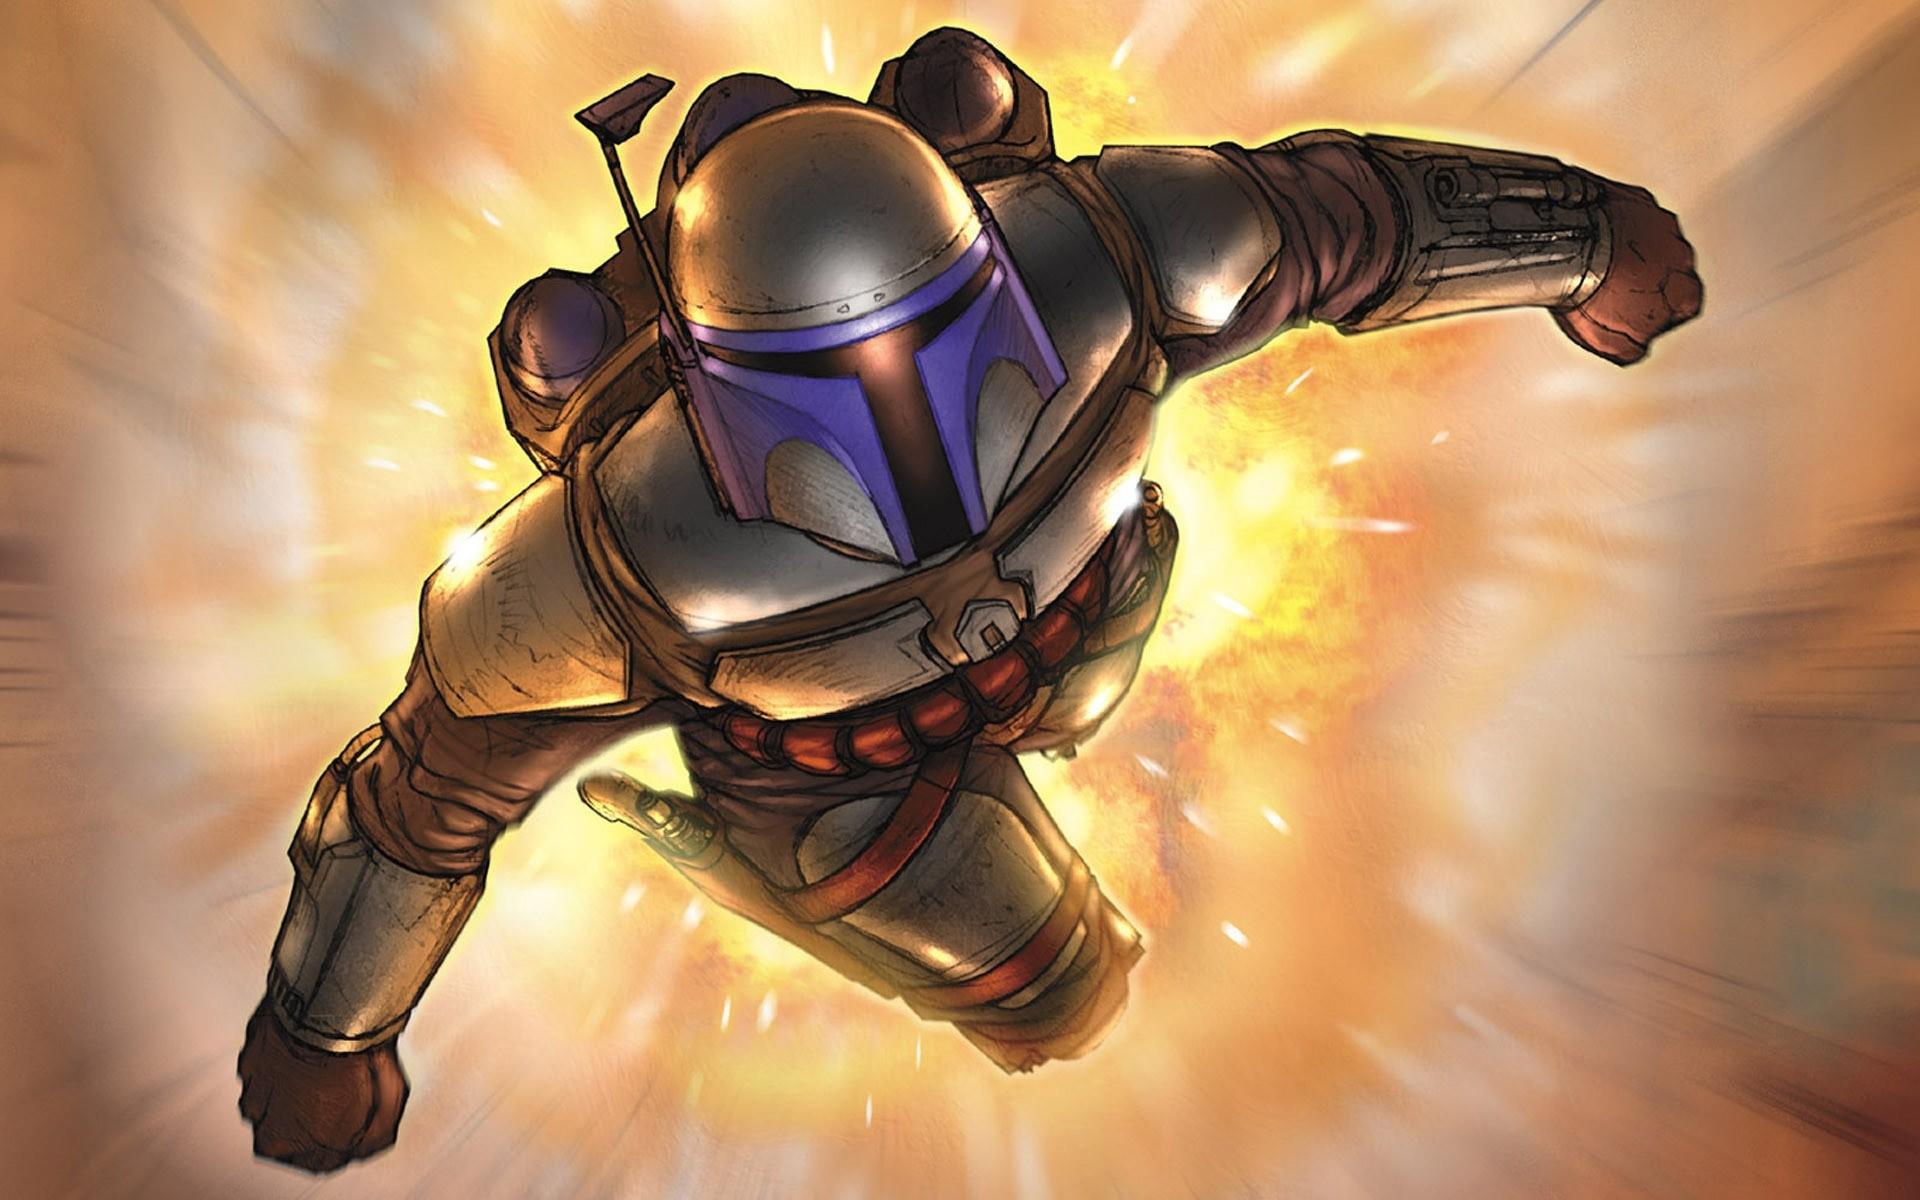 Star Wars – Boba Fett Wallpaper by desktop.freewallpaper4.me